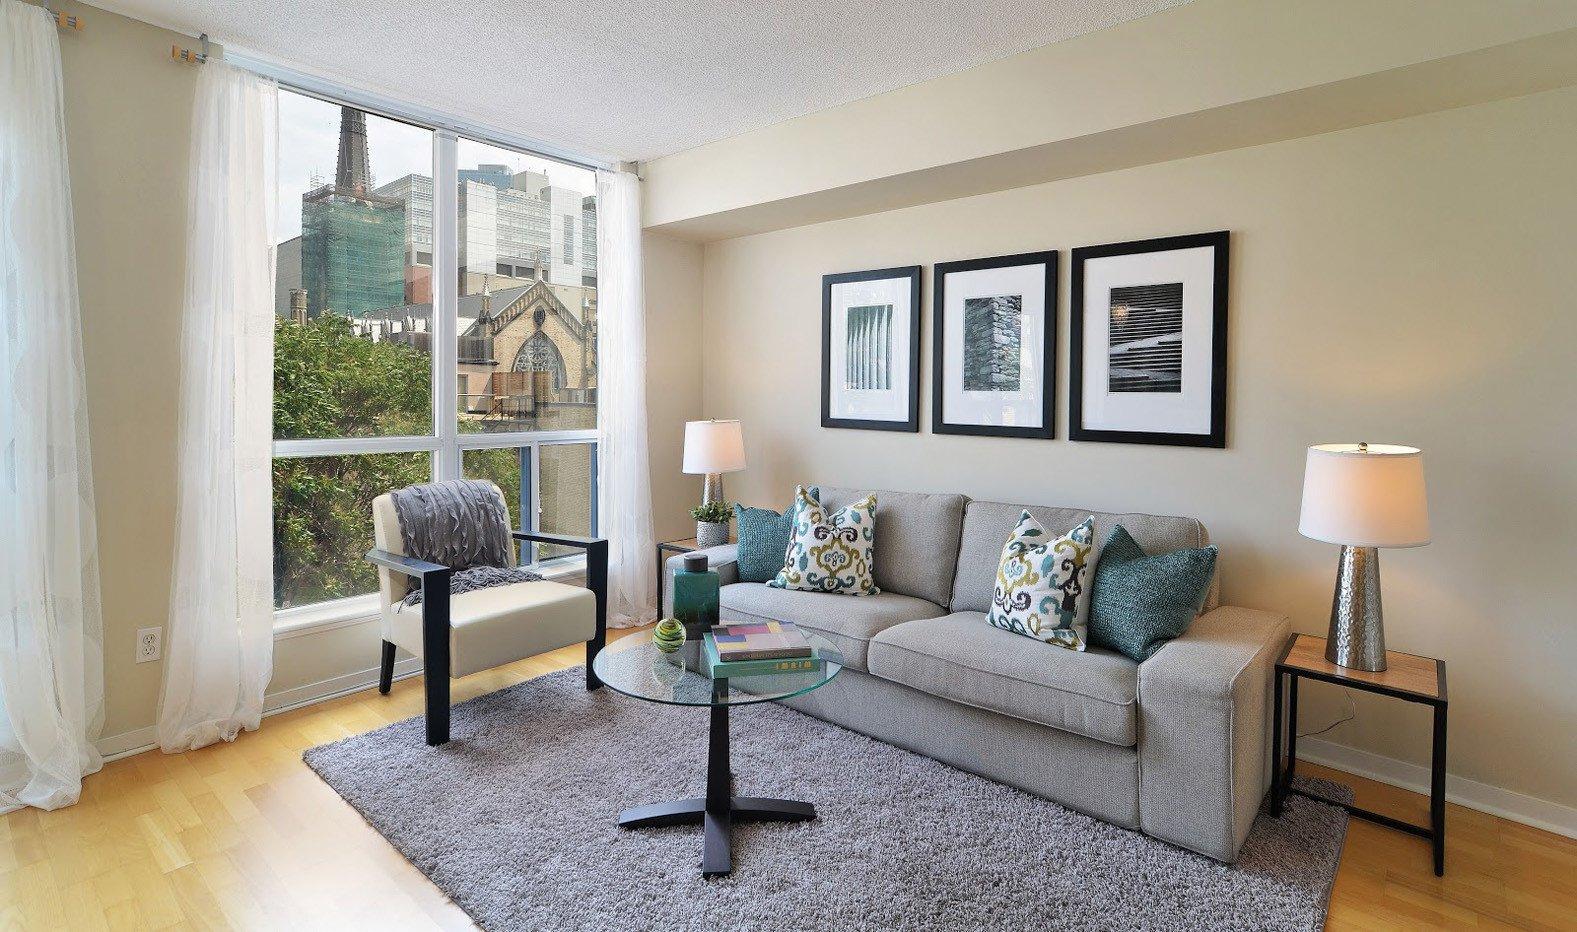 Modern Condo Living Room Decorating Ideas Luxury 33 Modern Condo Interior Design Ideas